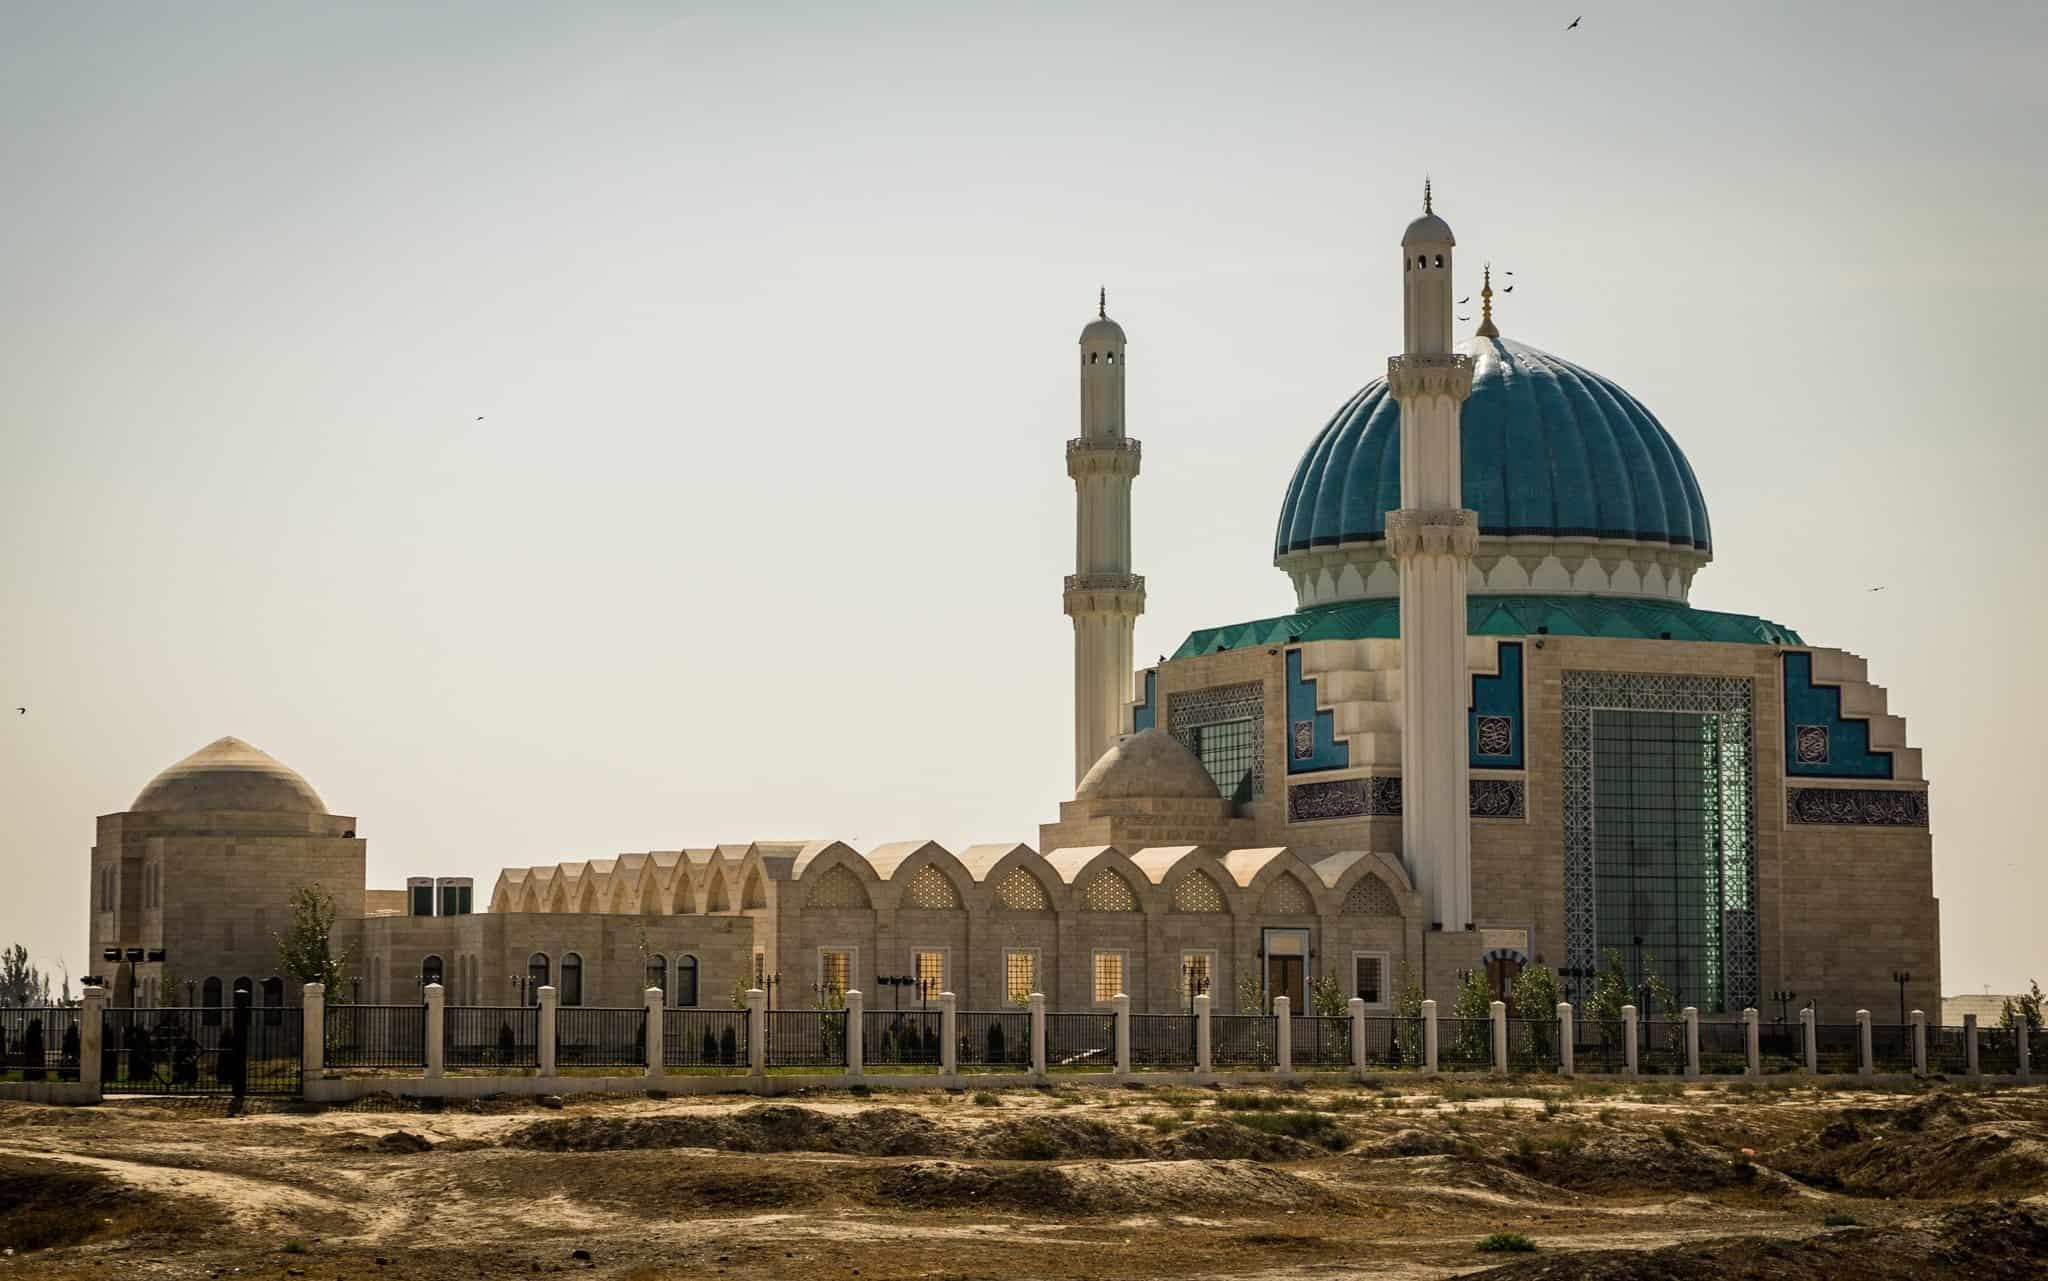 Turkistan Mosque the Mausoleum of Khawaja Ahmed Yasawi